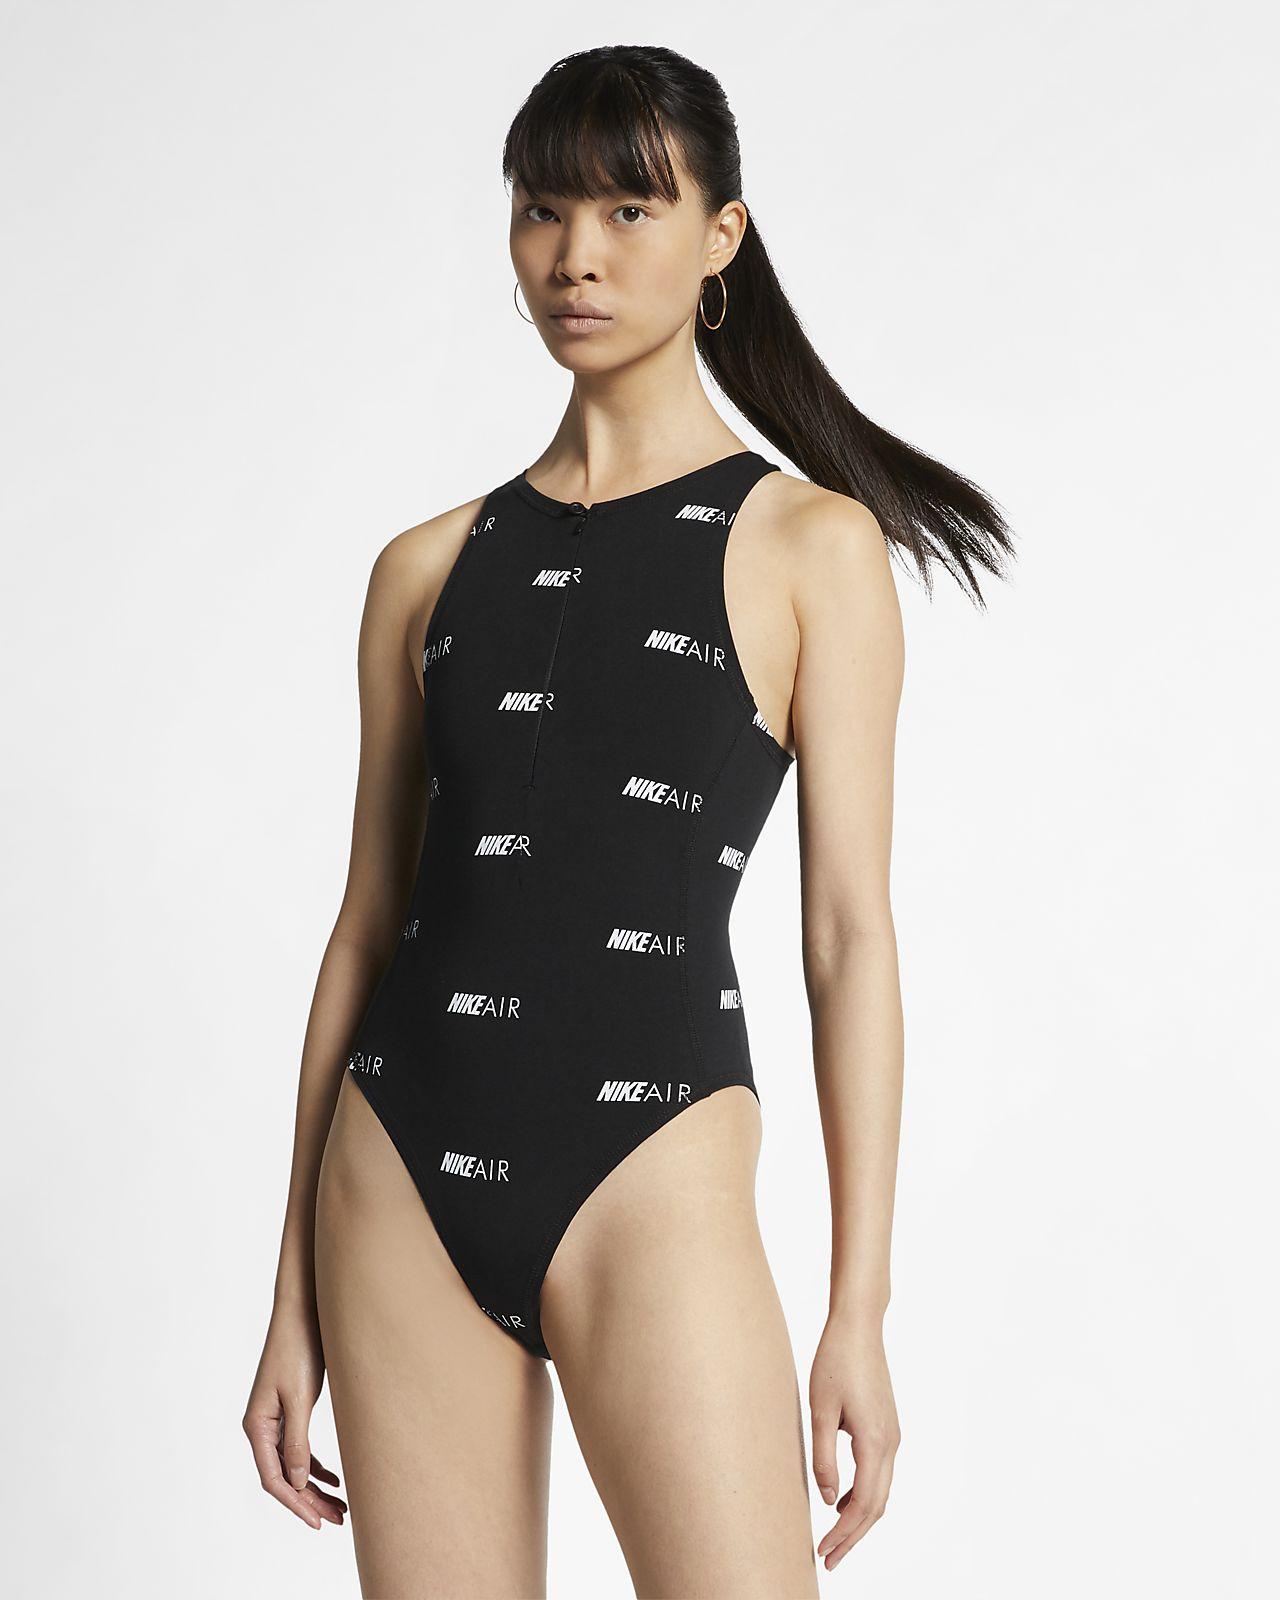 Nike Air Women's Bodysuit